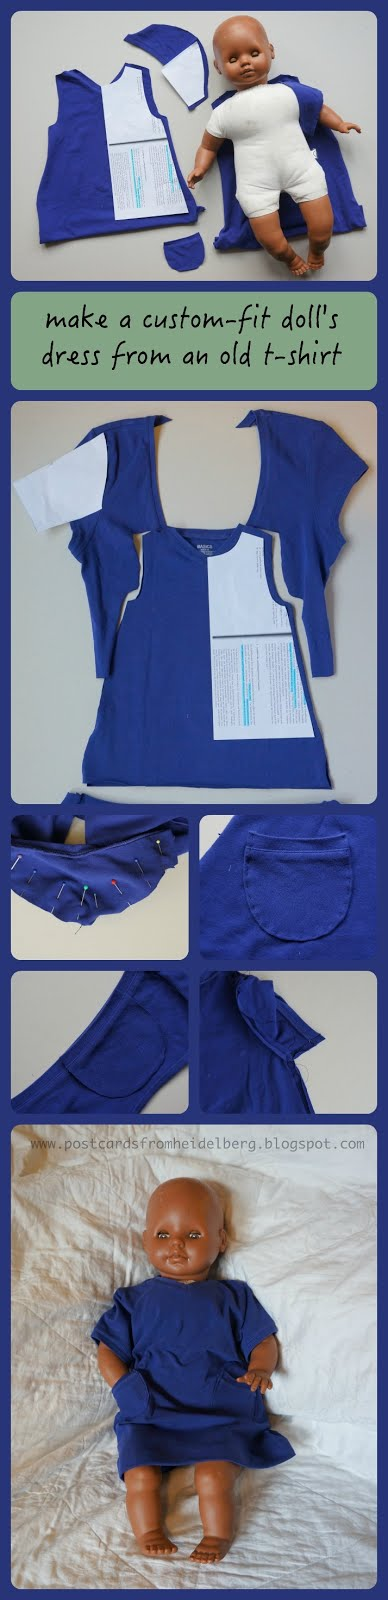 doll dress sewing tutorial